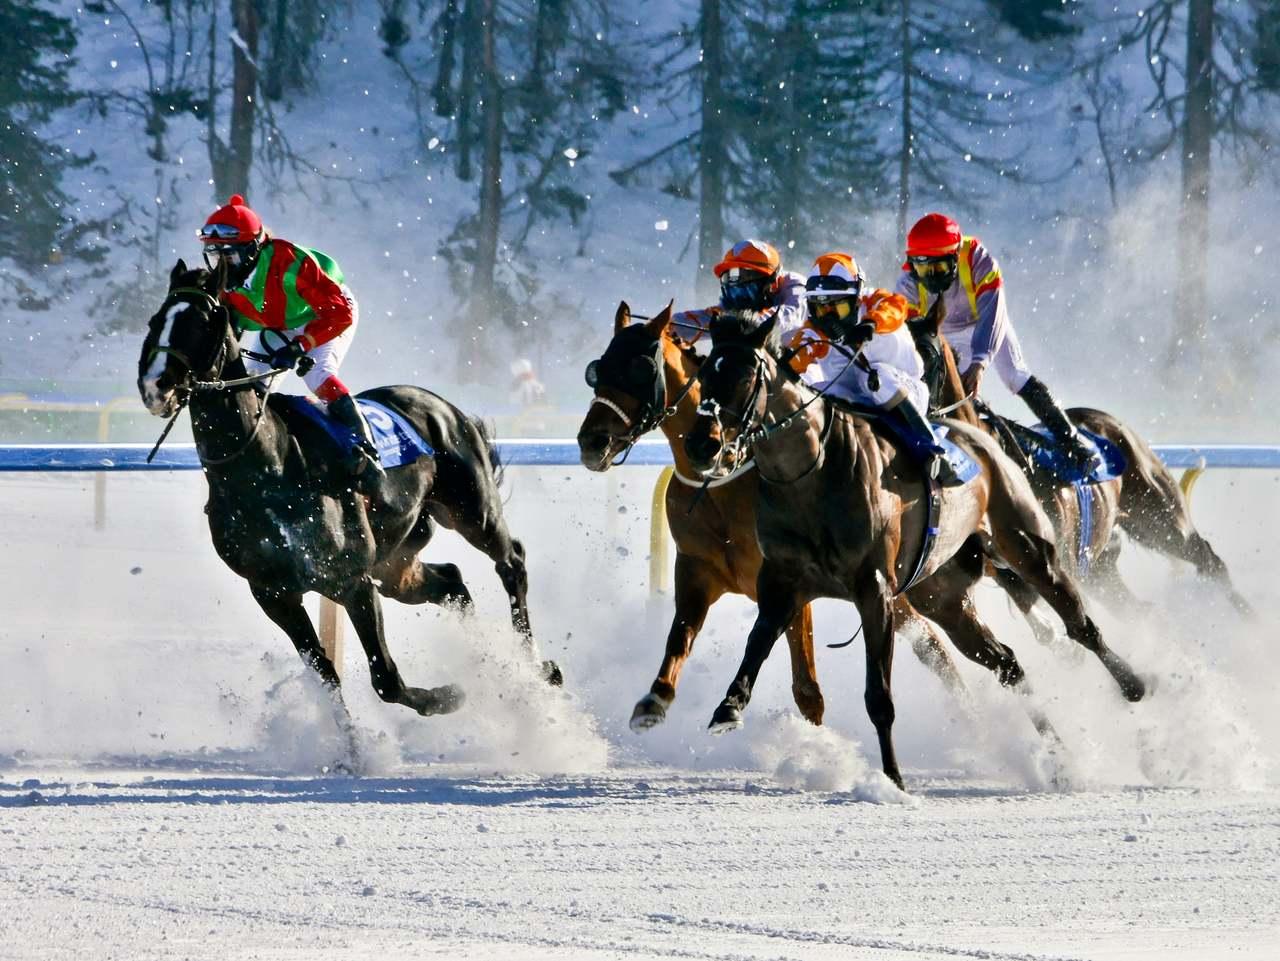 Horse Racing On Snow White Turf Racing Festival St Moritz Switzerland